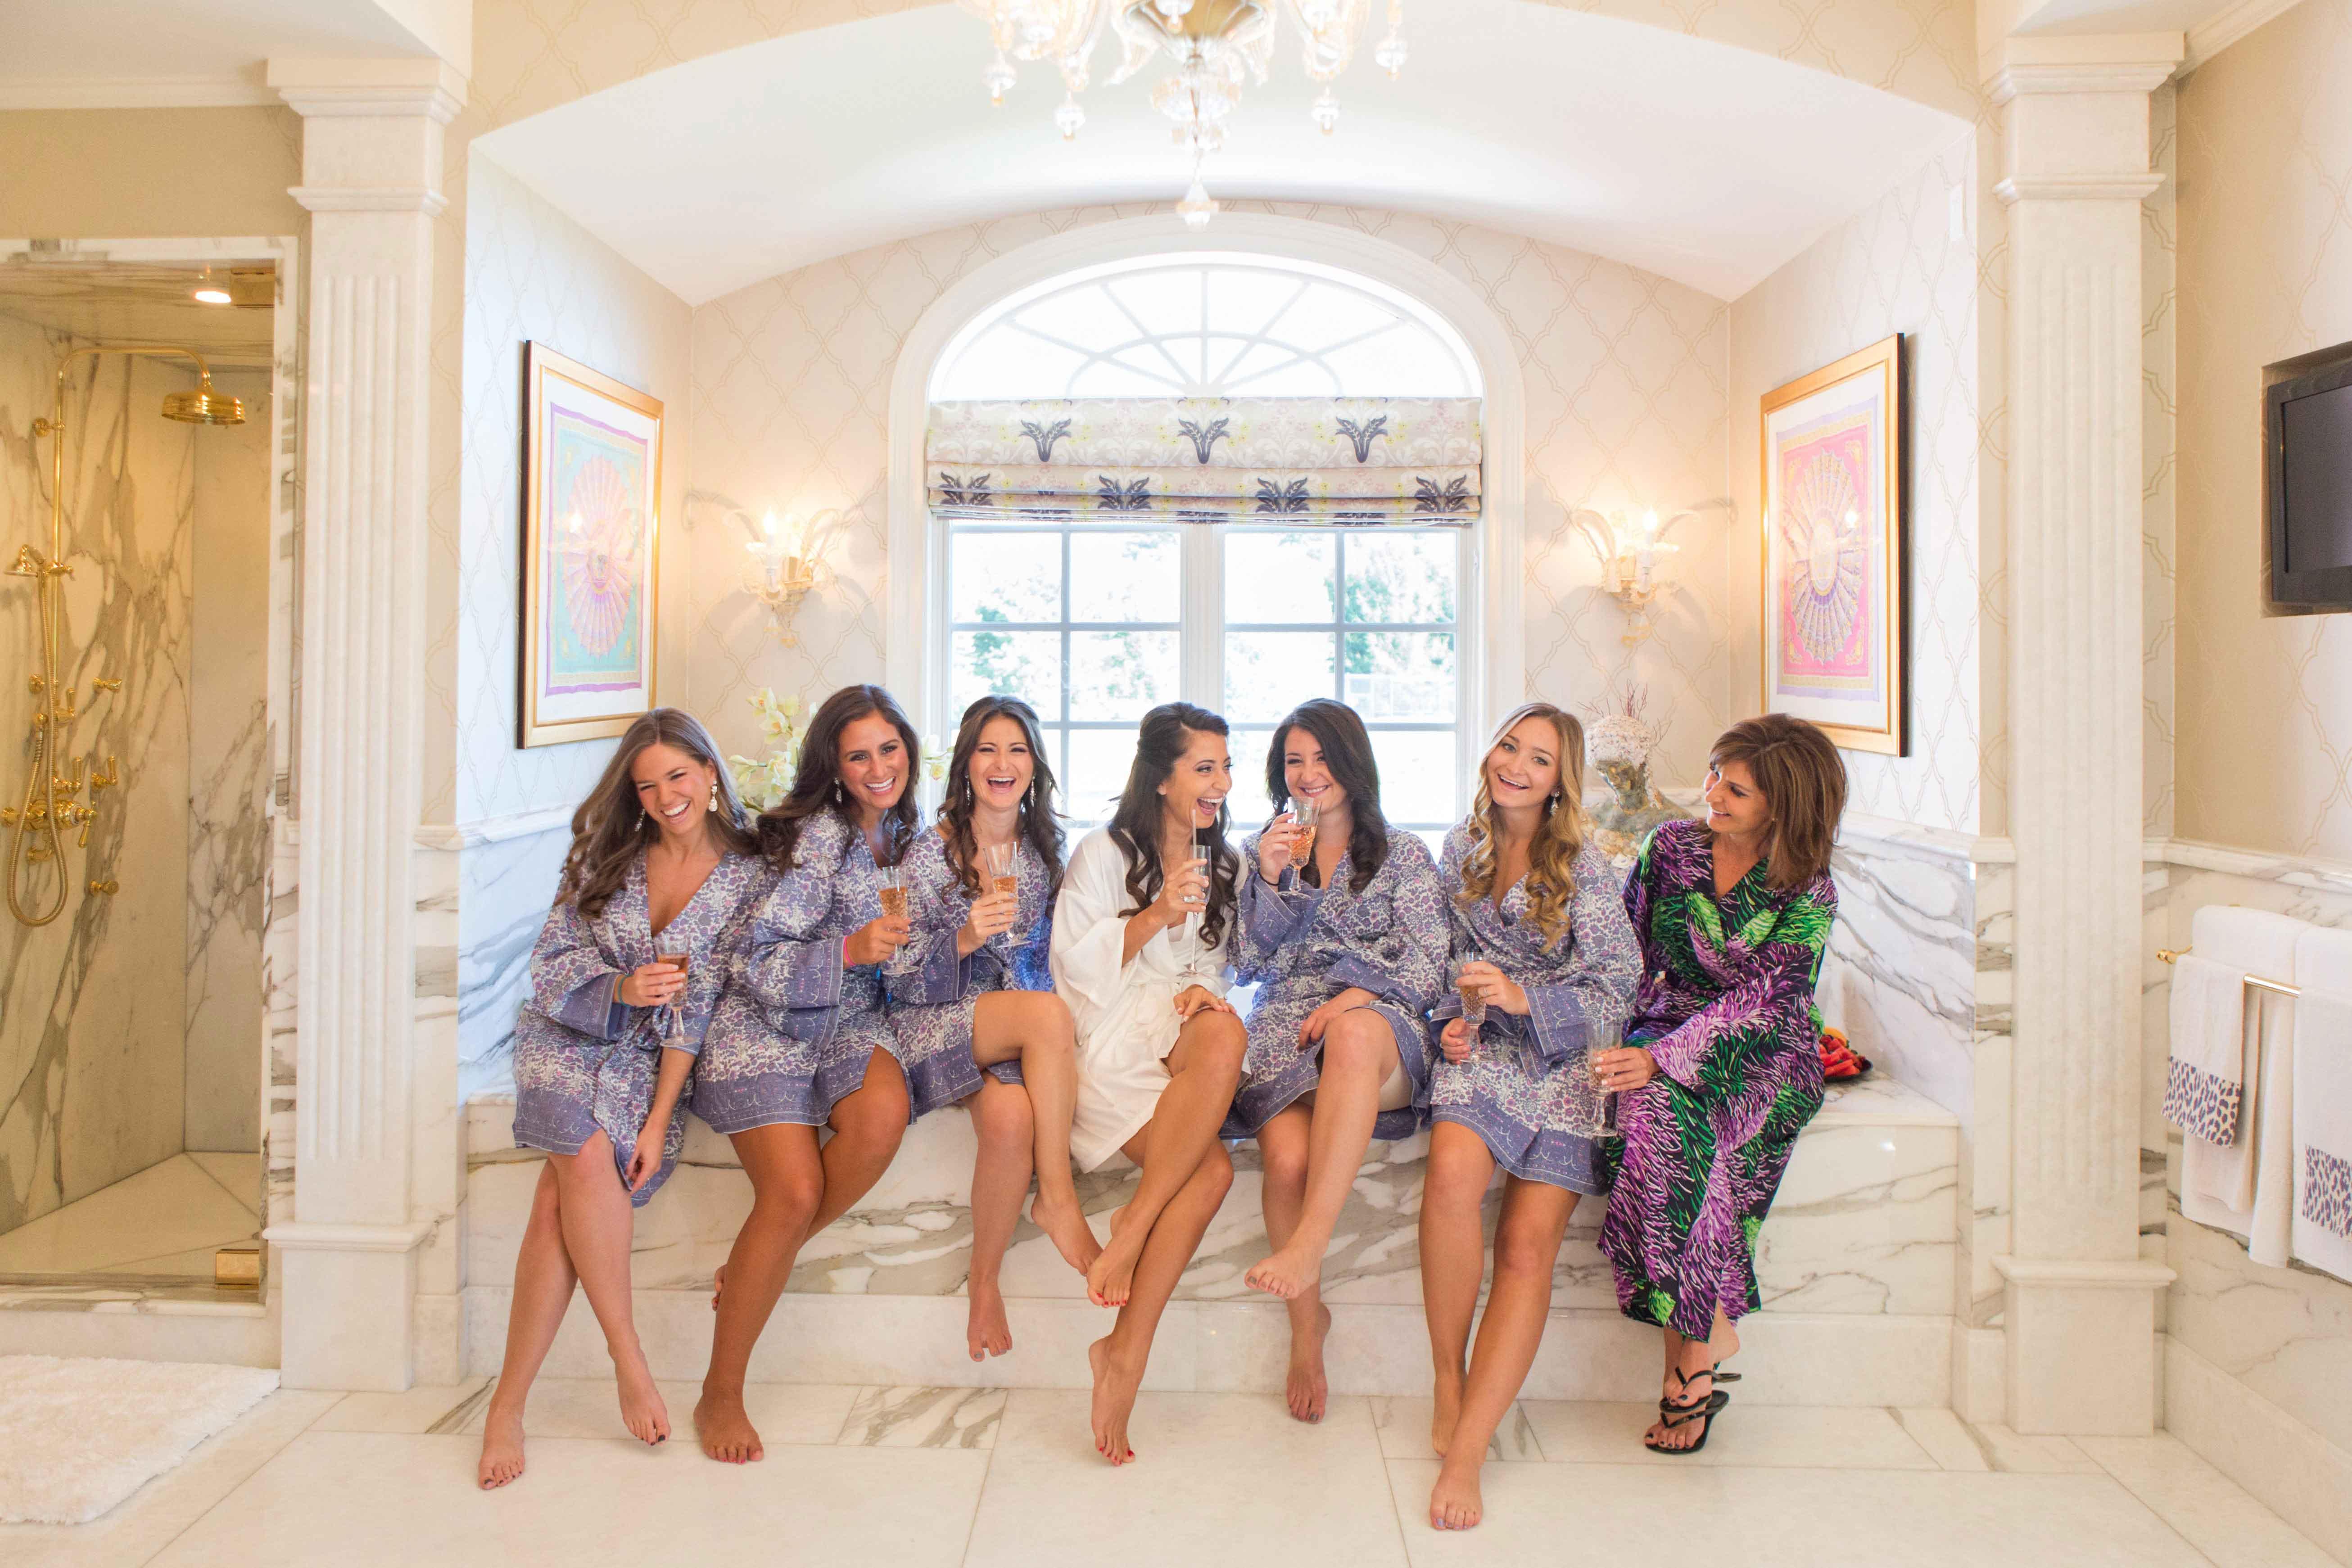 Bridesmaids in marble bathroom in floral print robes